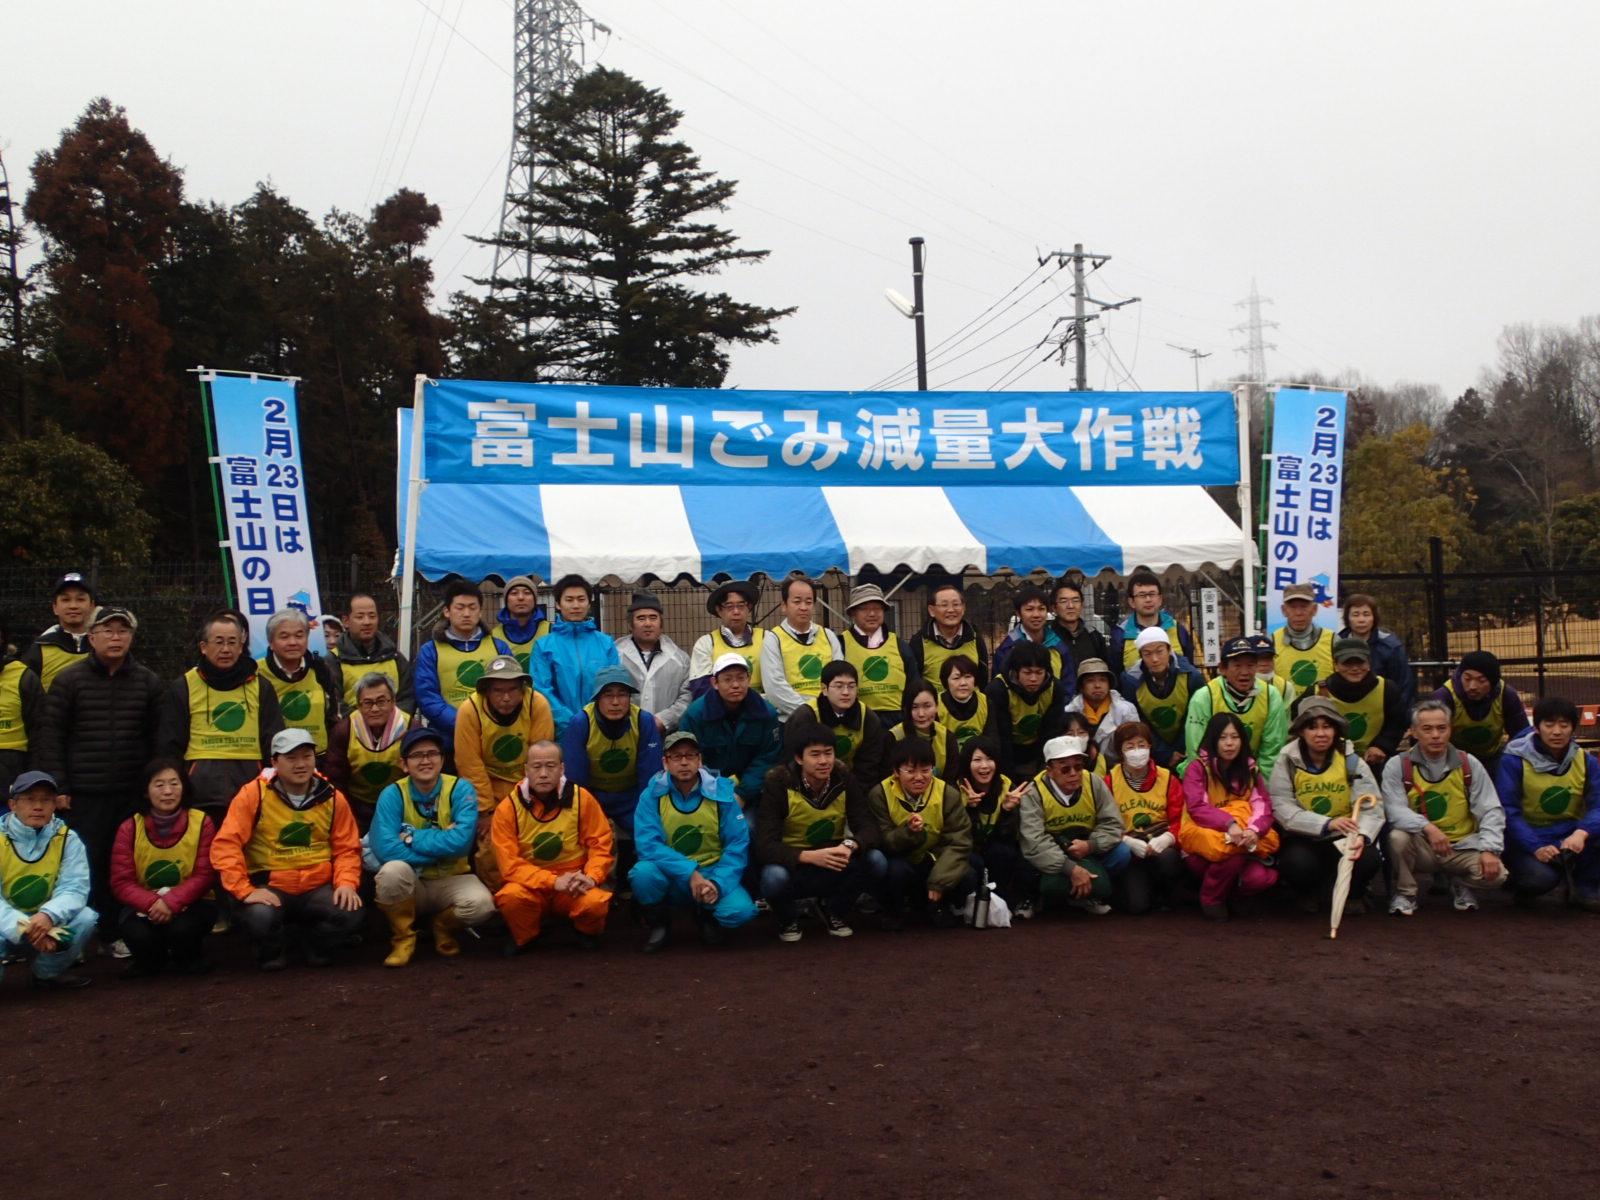 src=http://www.fuji-nanryo.jp/file_master/misc/P2021099(1).jpg